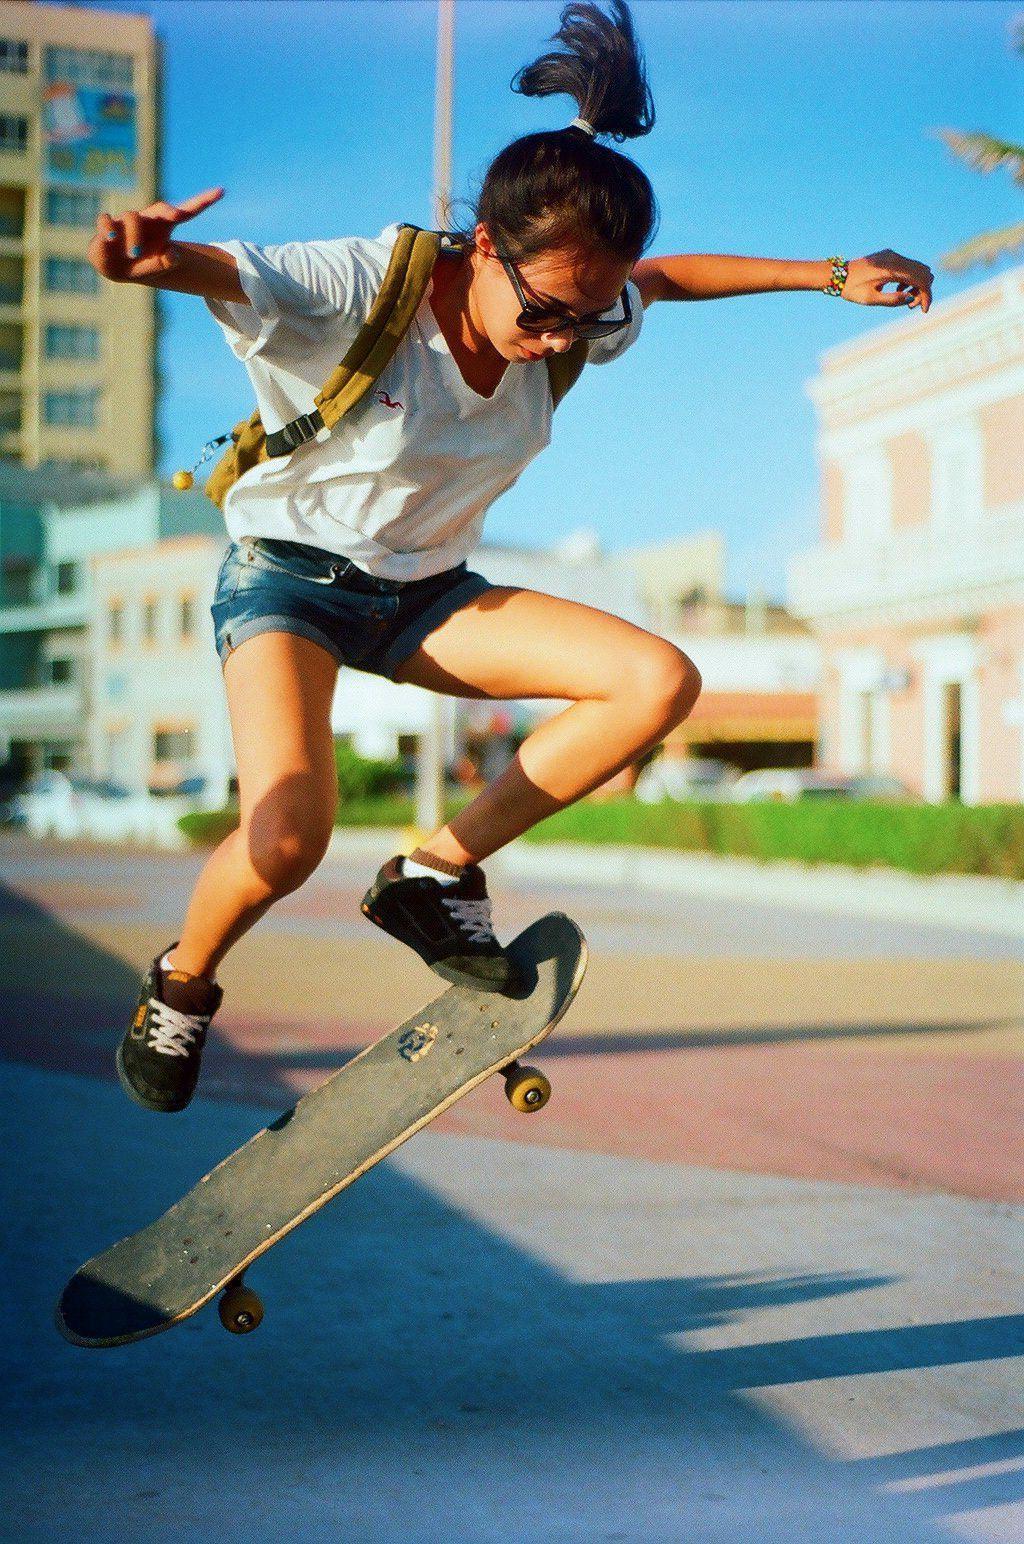 Skateboard Girls Wallpapers - Wallpaper Cave